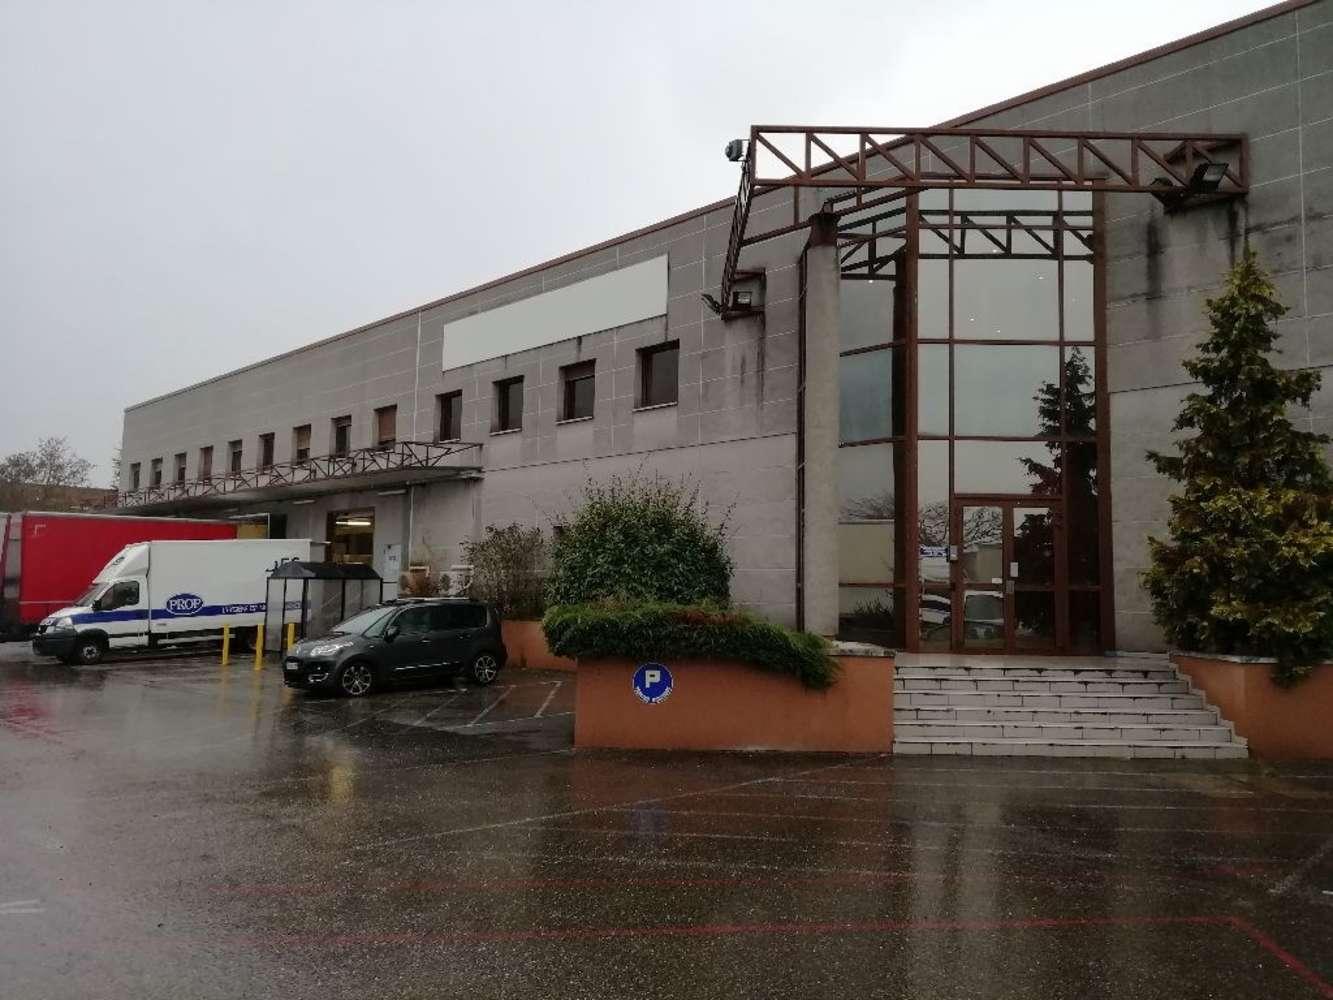 Activités/entrepôt Genas, 69740 - Location entrepot Genas - Lyon (69) - 10239897